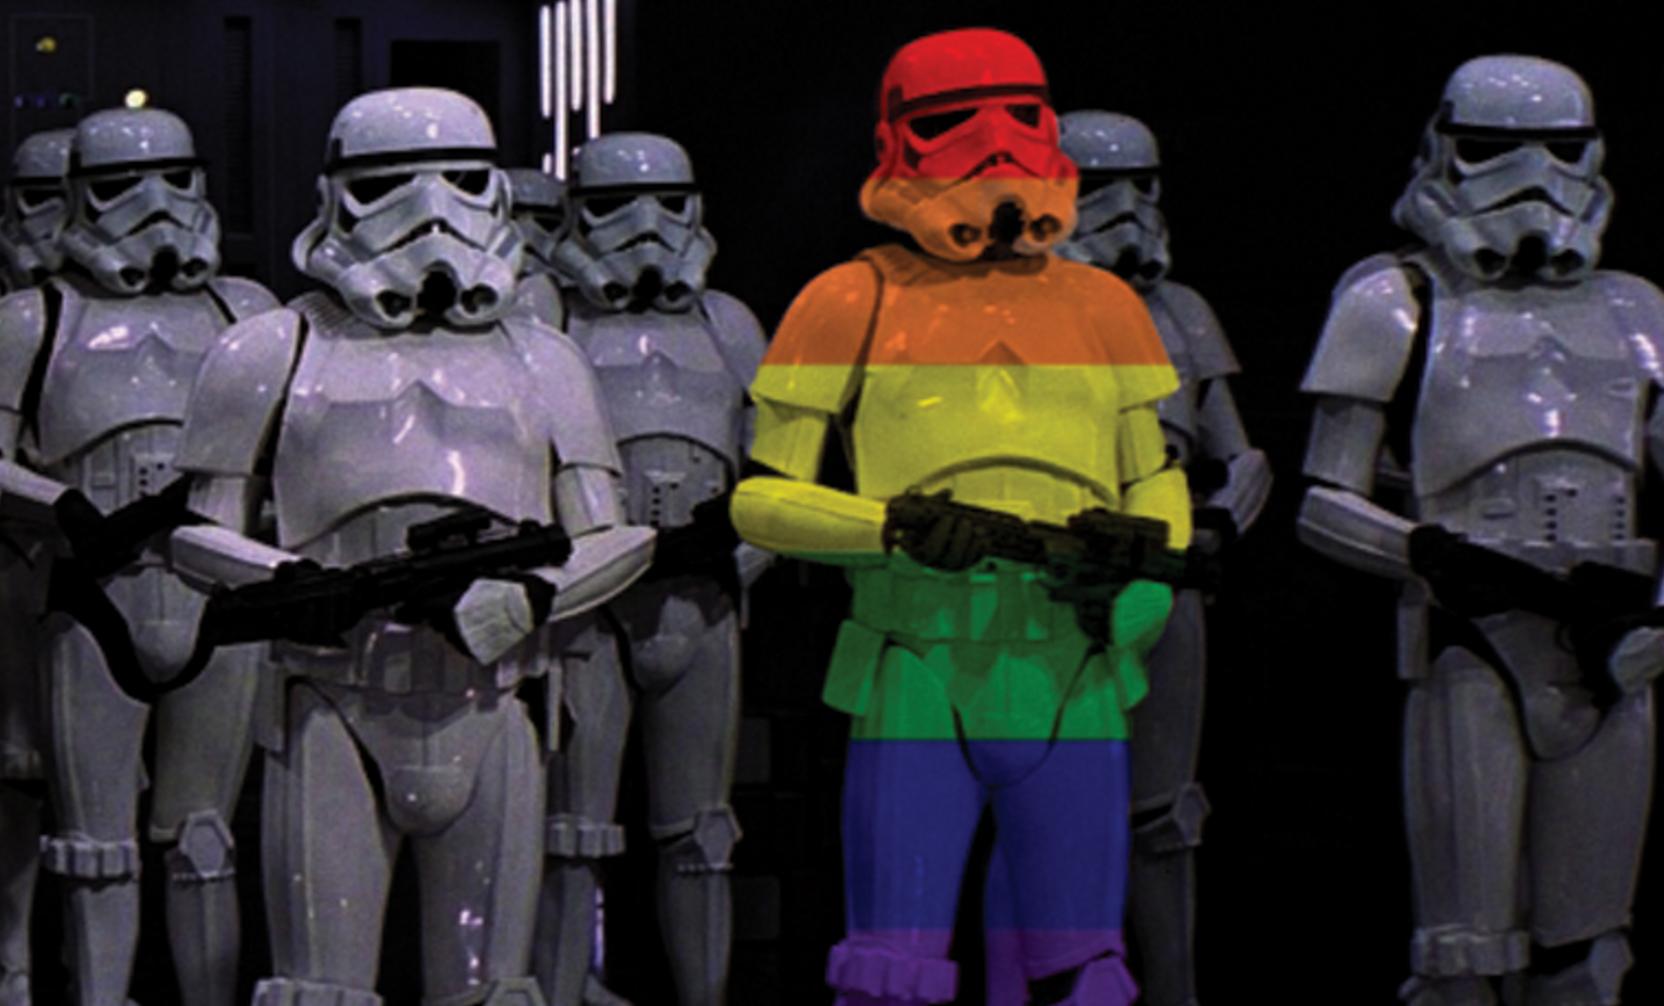 Queer wars gay pride shirt star wars parody lgbt shirt